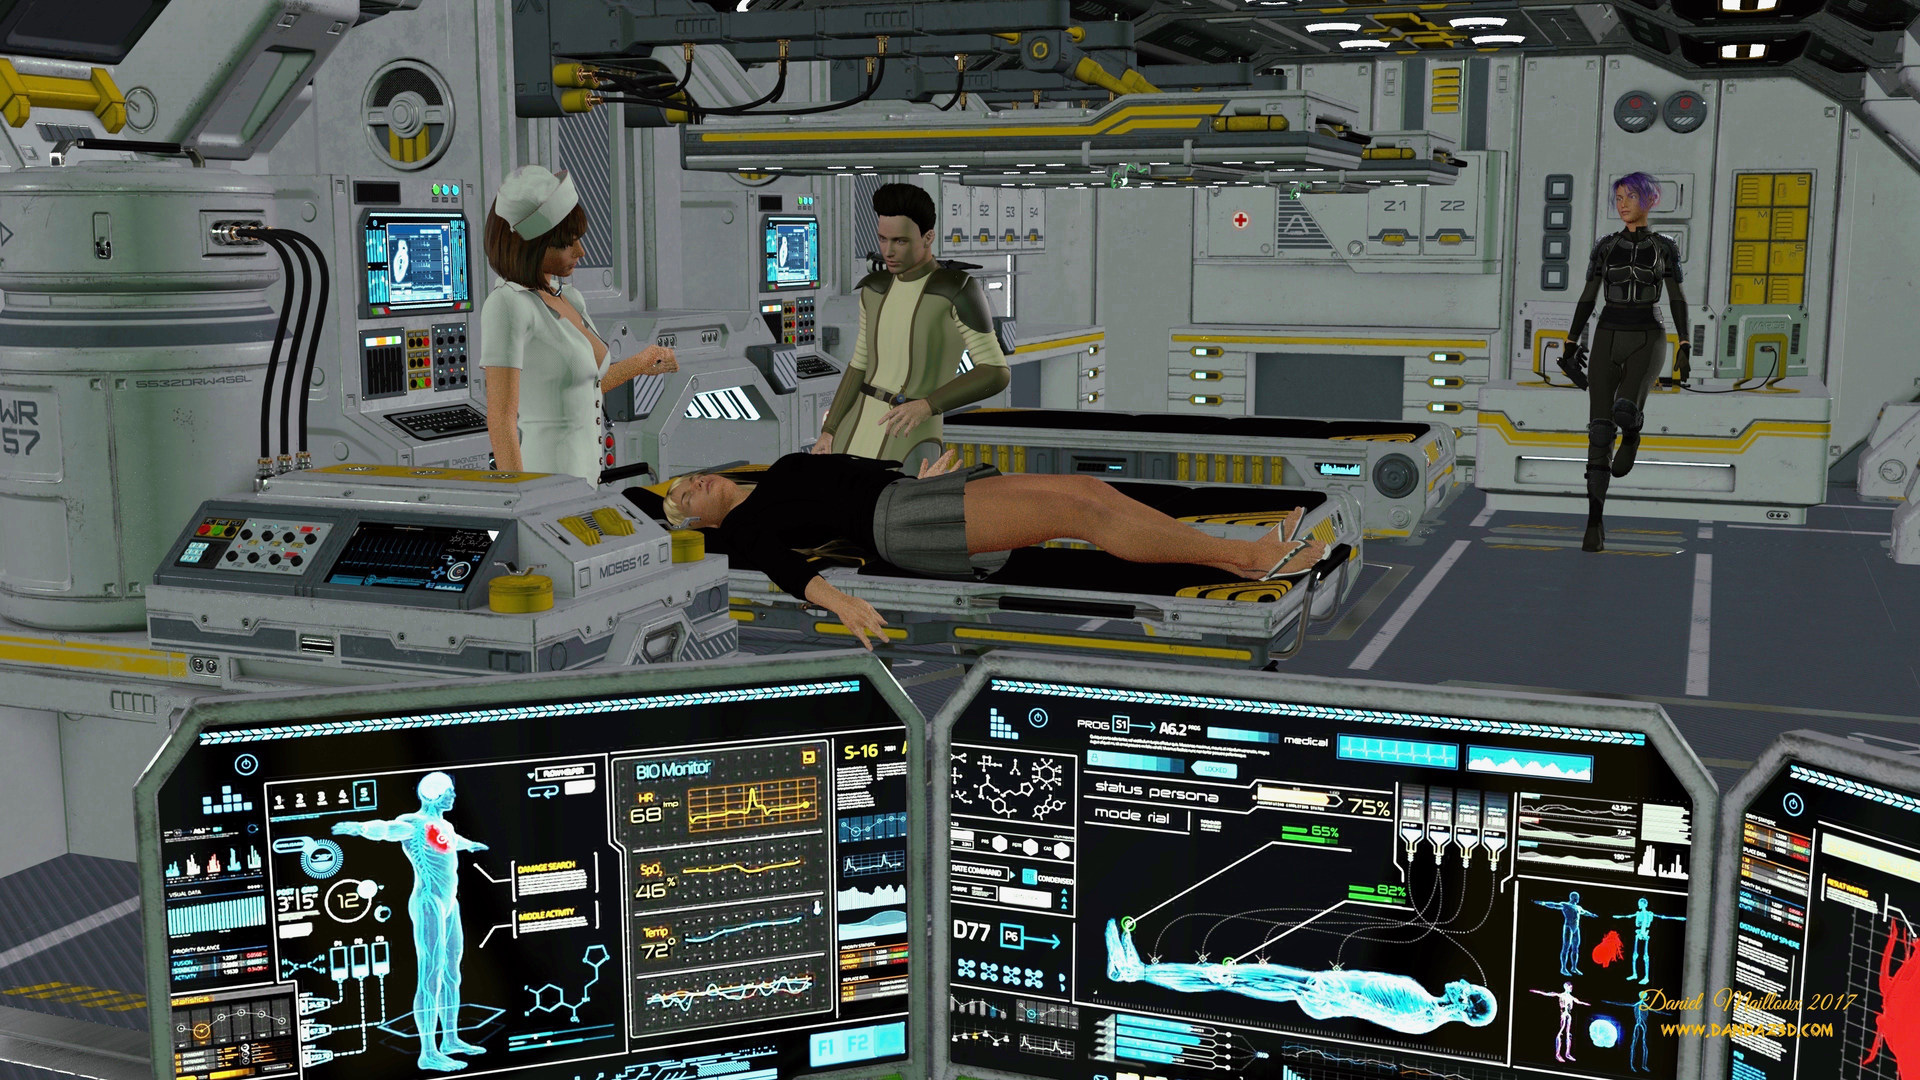 Time travel hospital